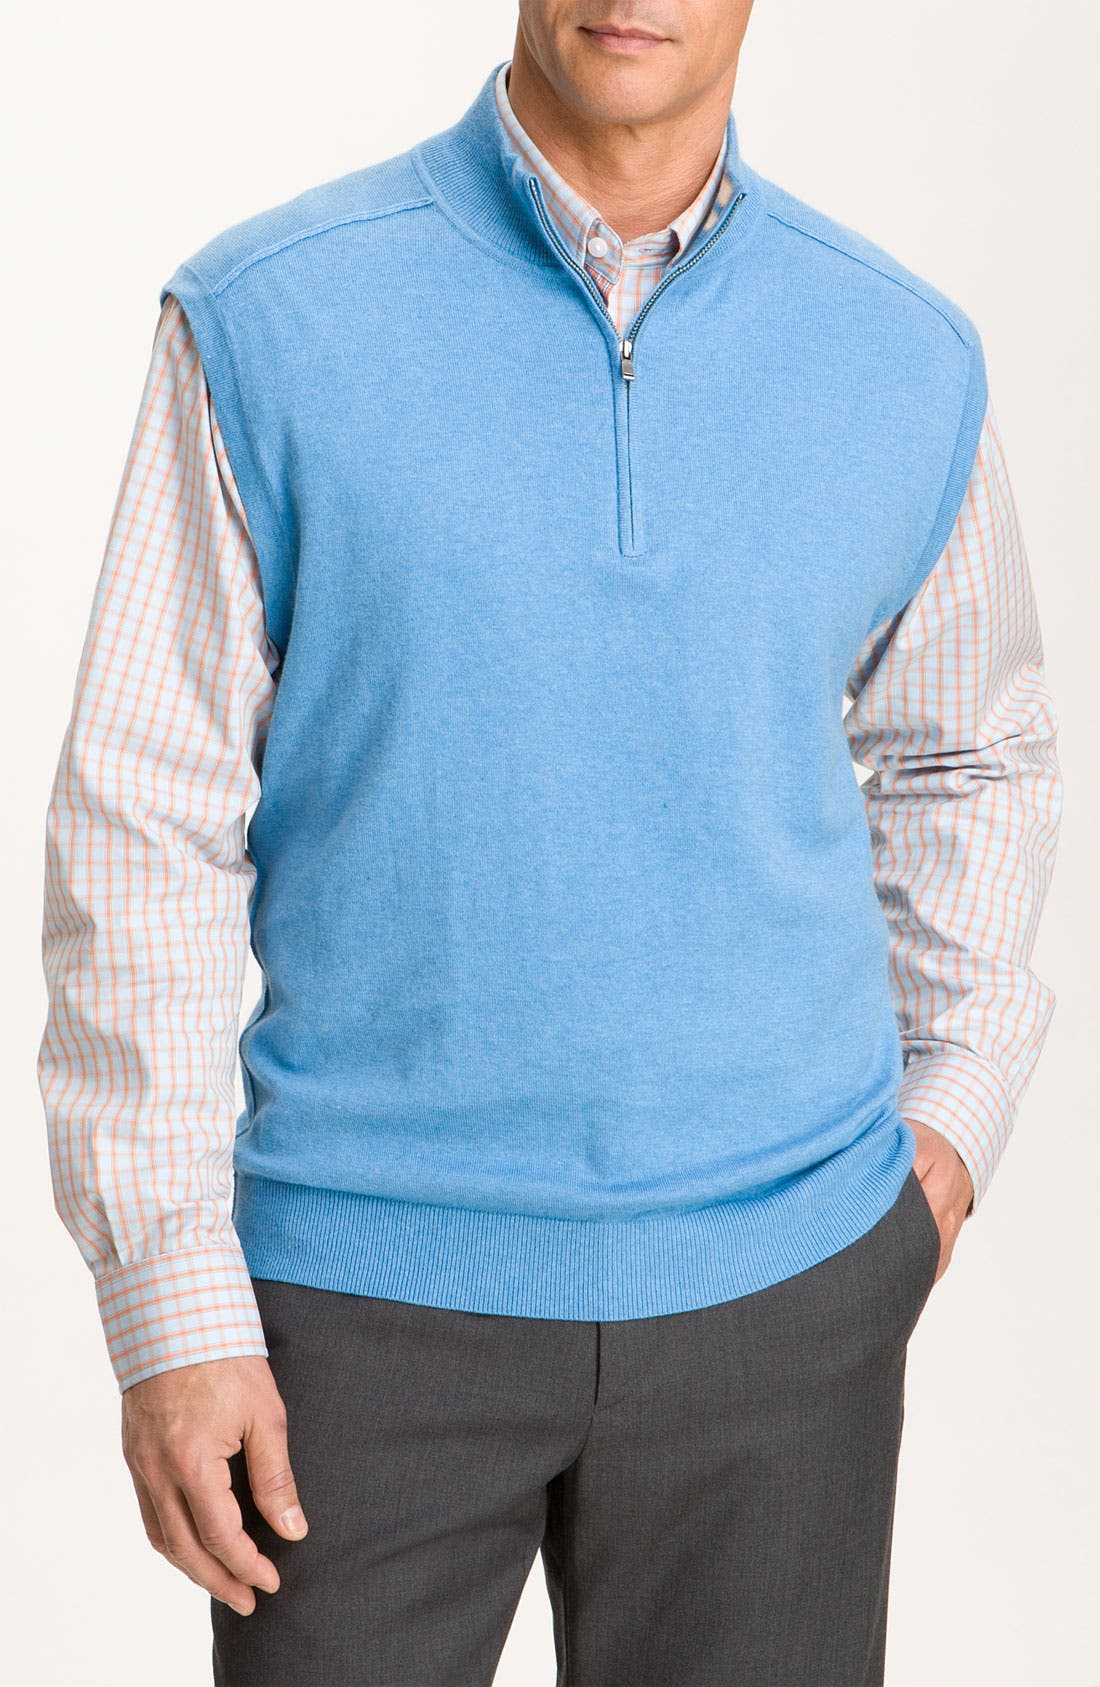 Alternate Image 1 Selected - Cutter & Buck 'Thomas' Half Zip Vest (Big & Tall) (Online Exclusive)